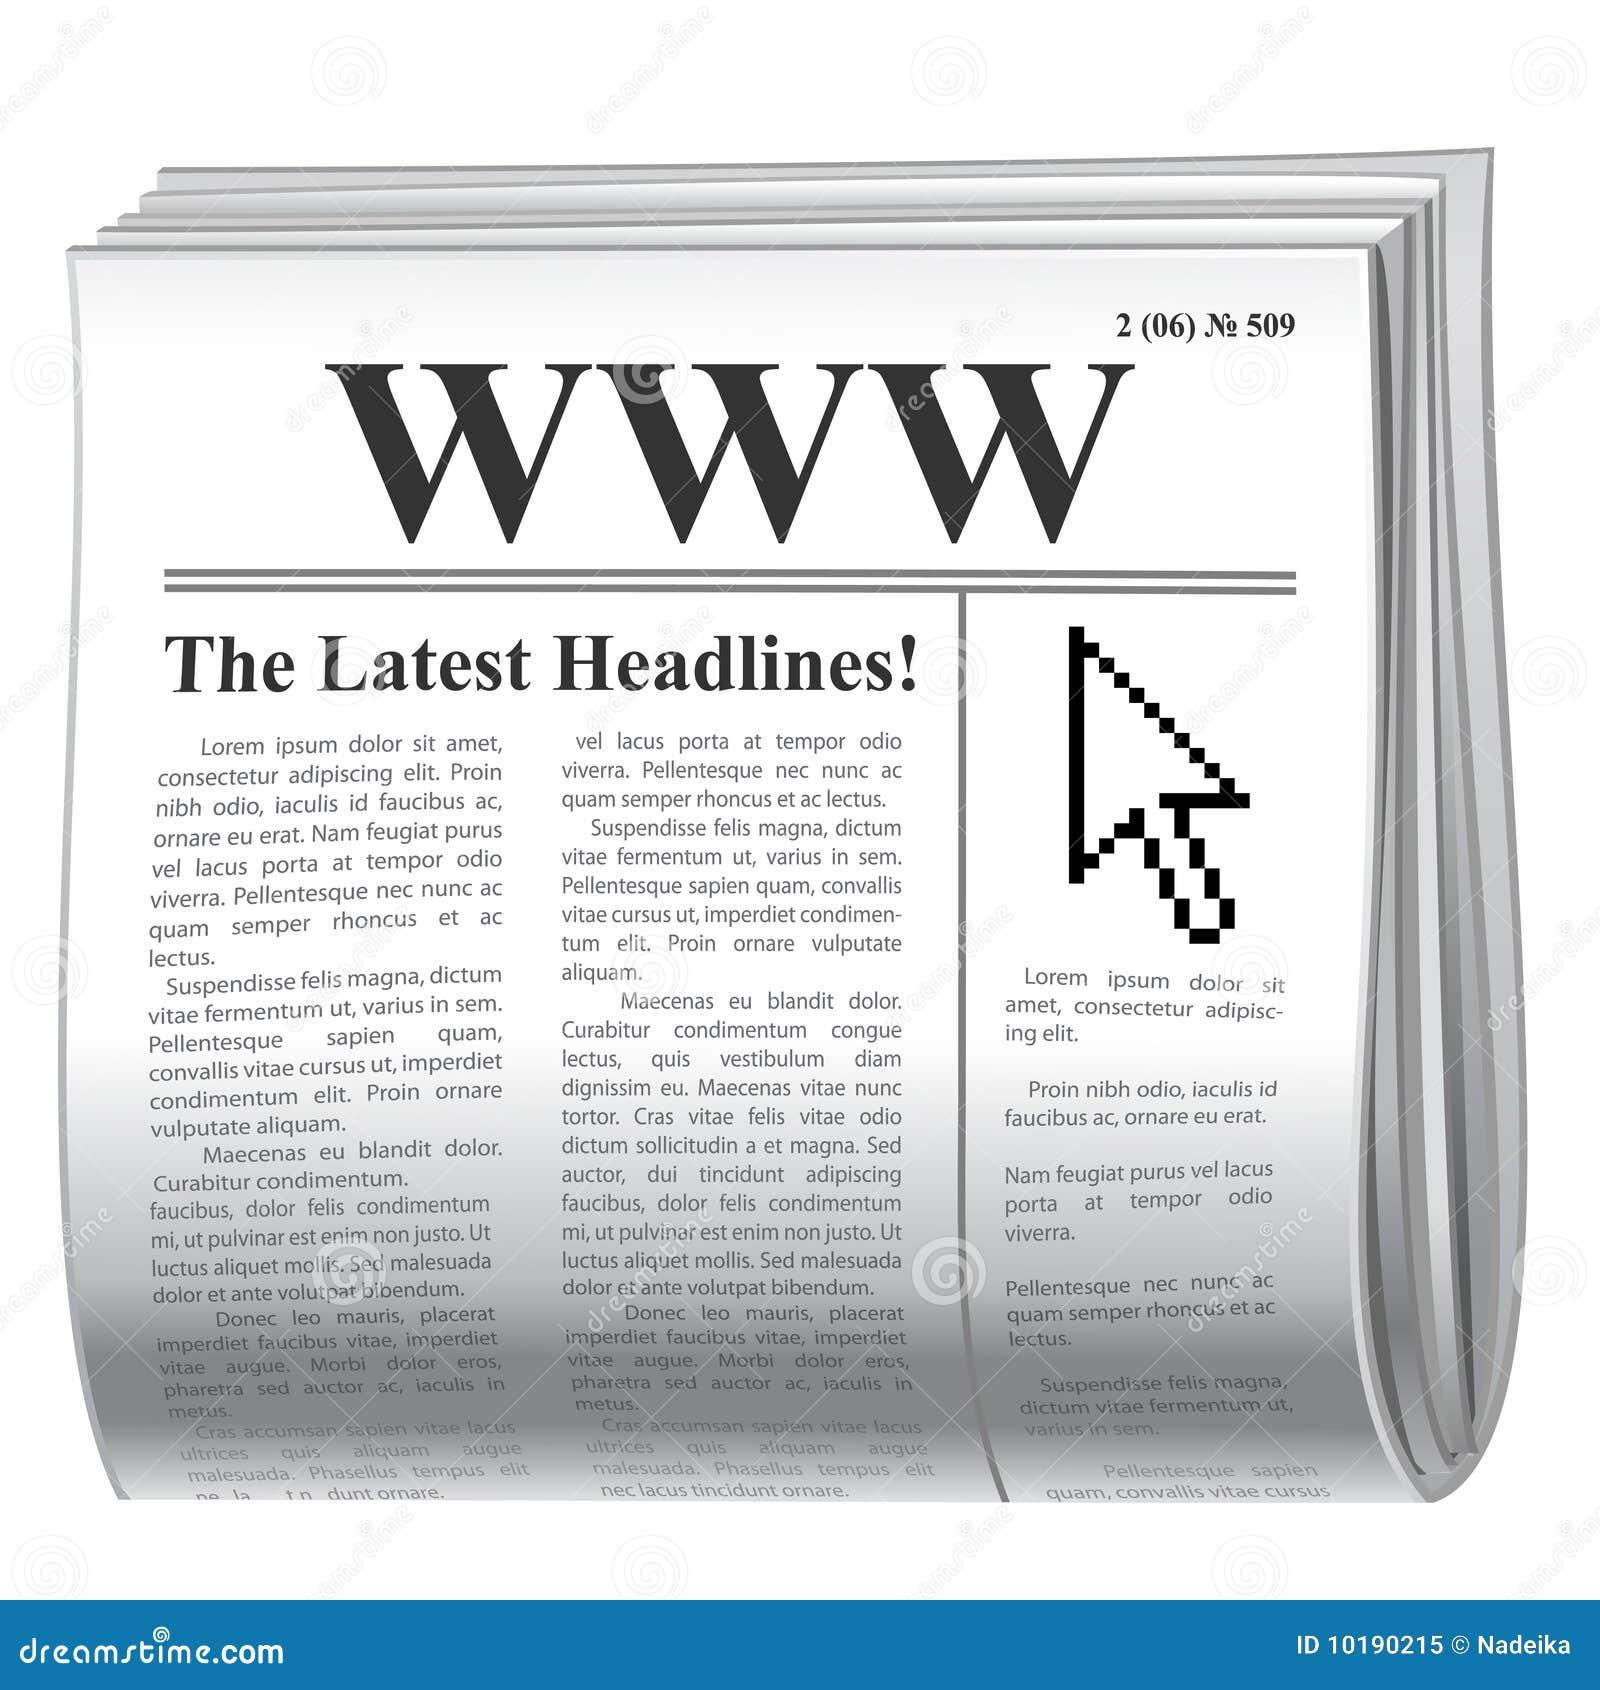 Inet news